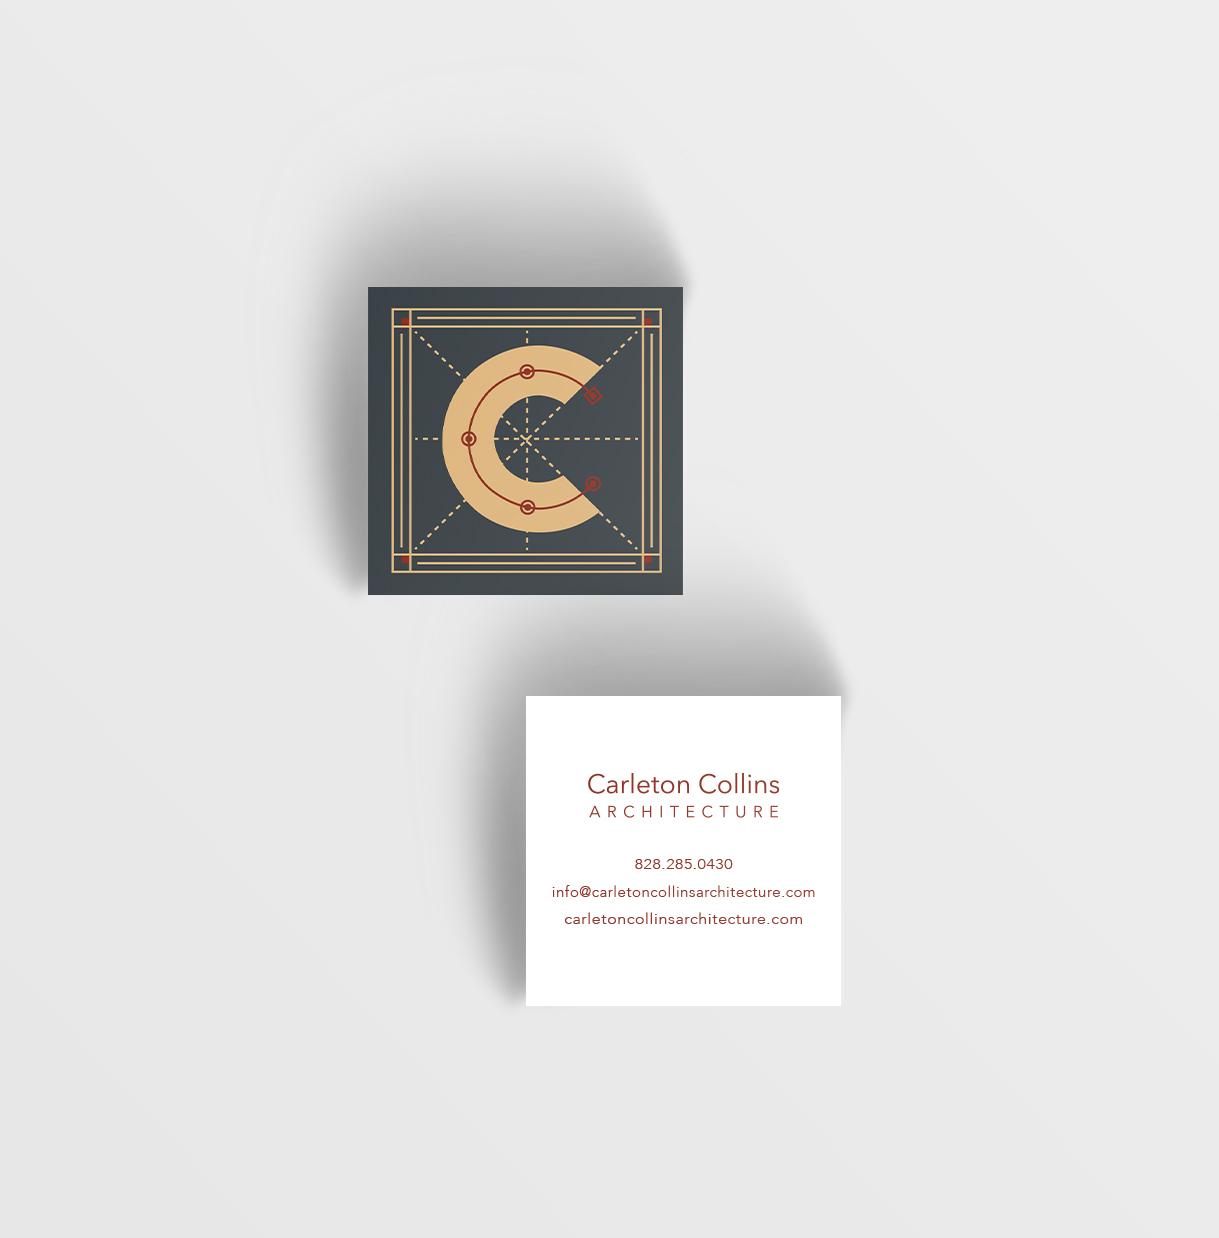 CC_Business Card Mockup21.jpg